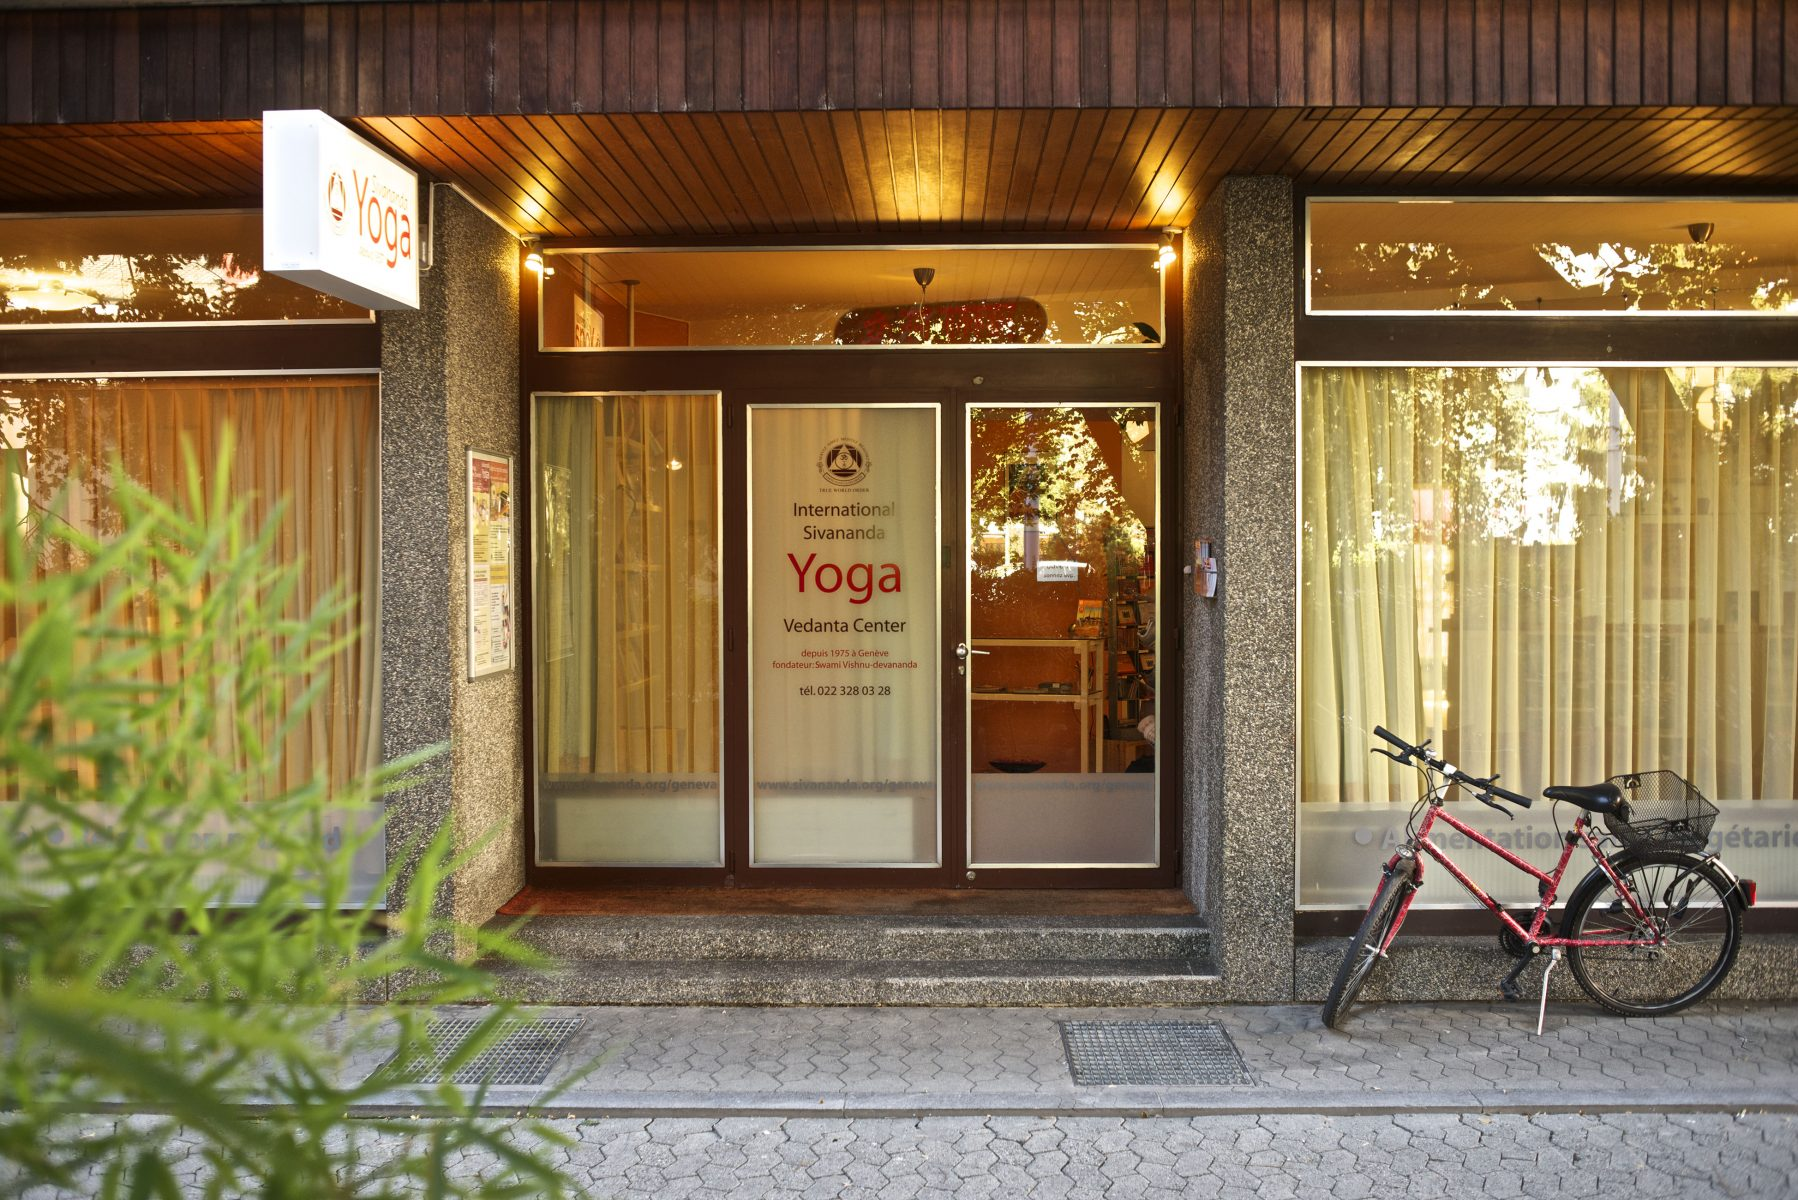 "<div style=""font-family: catamaran; color:#ffffff"">Centre de Yoga Sivananda</br><span style=""font-size: .8em"">Geneva | Switzerland</span></div>"